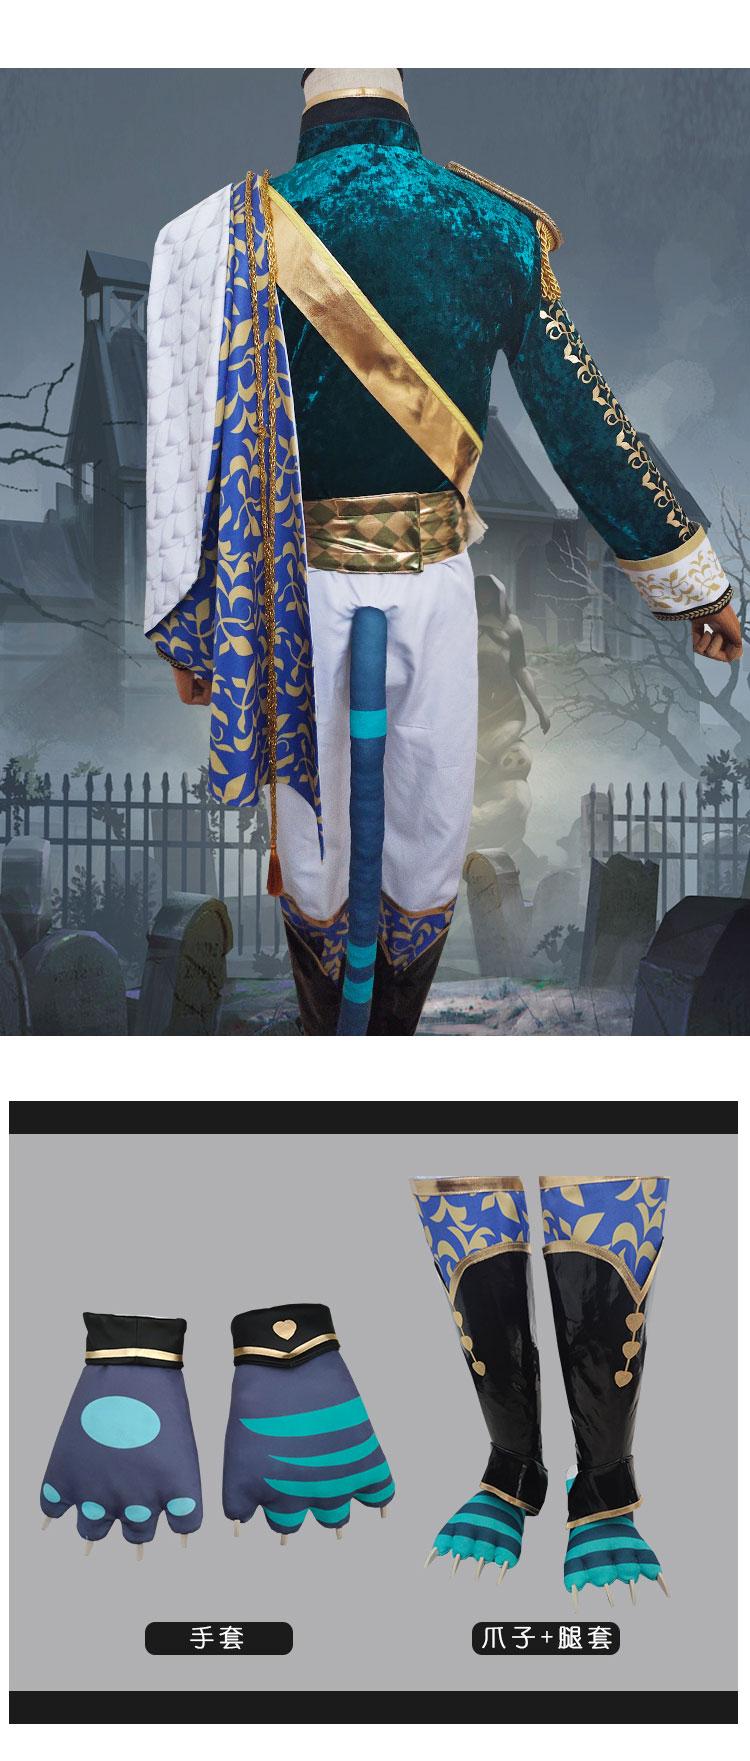 cheshire gato terno cosplay traje masculino jogo